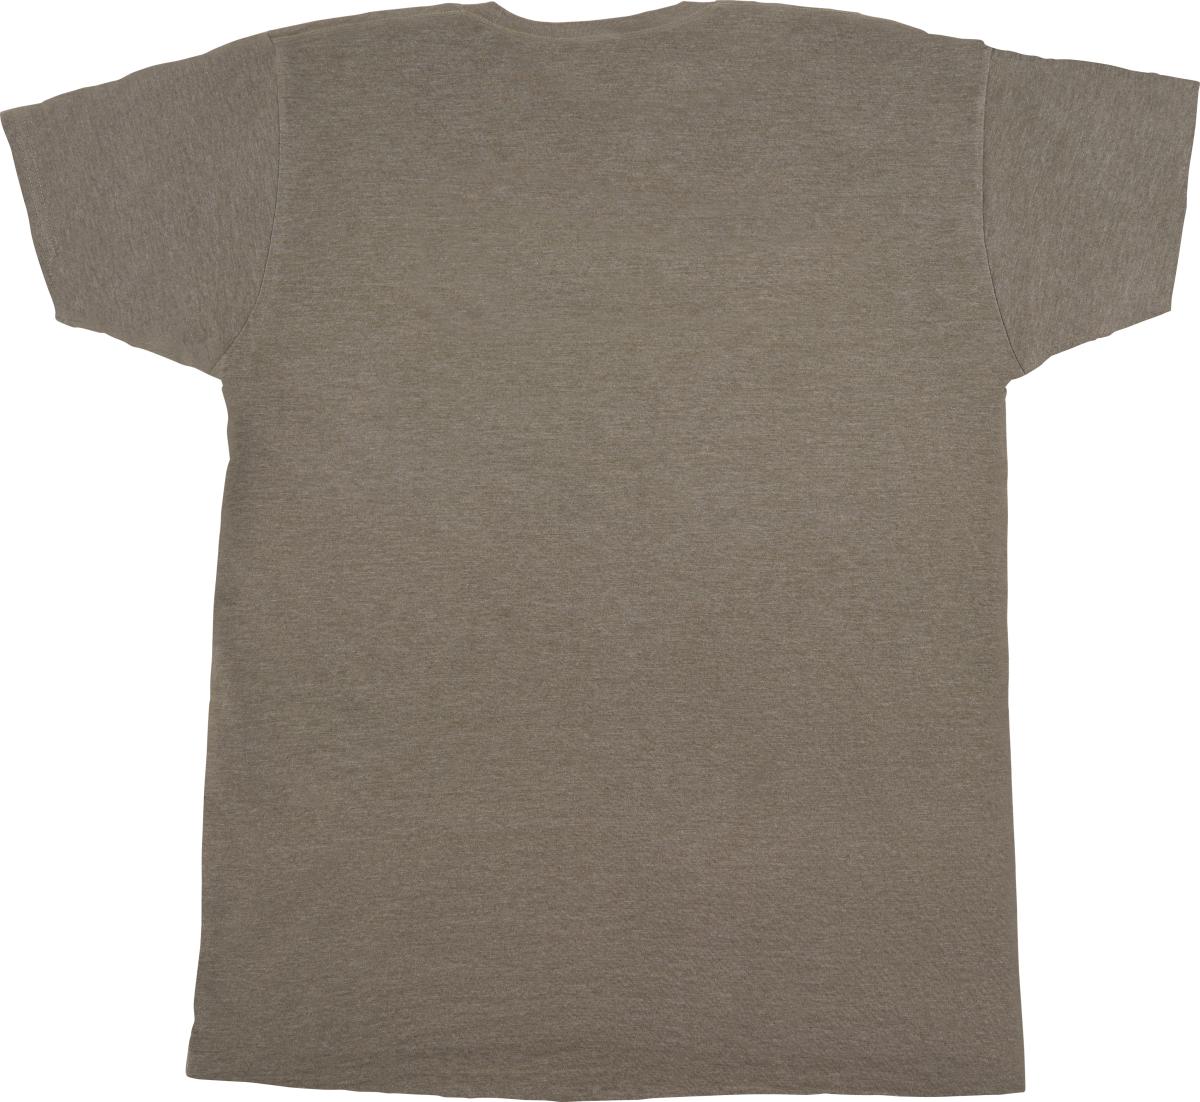 Charvel Charvel® Guitar Logo T-Shirt, Heather Green, XL